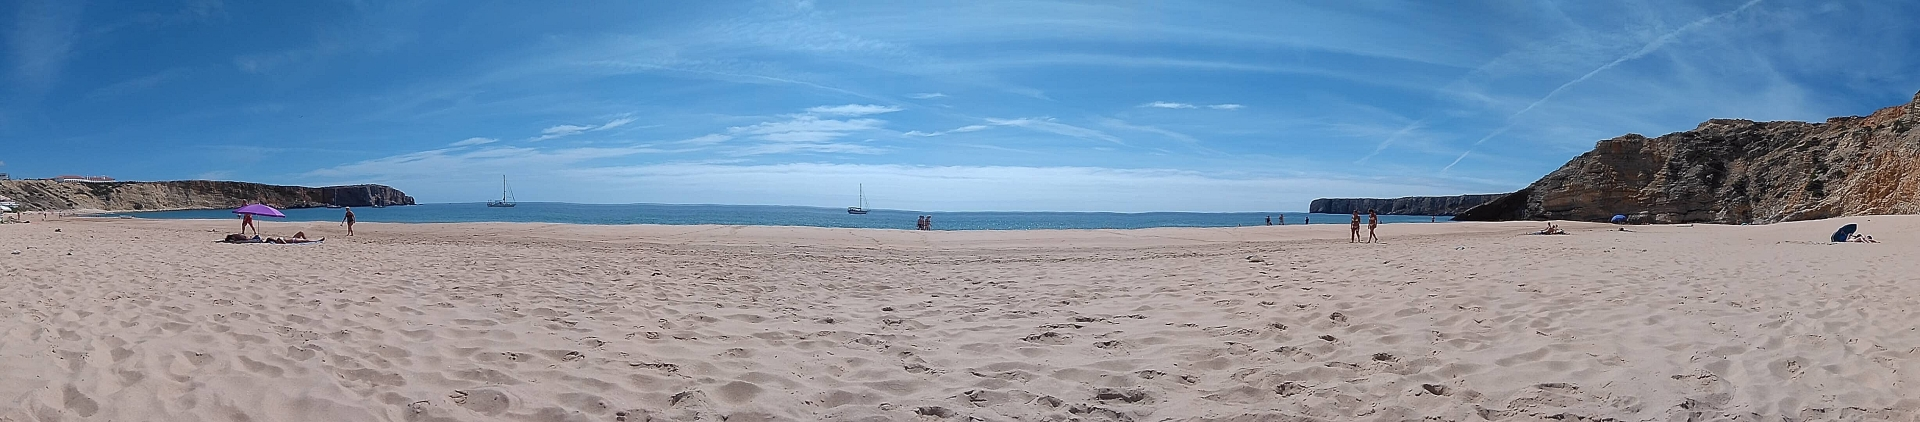 Praia da Martinhal